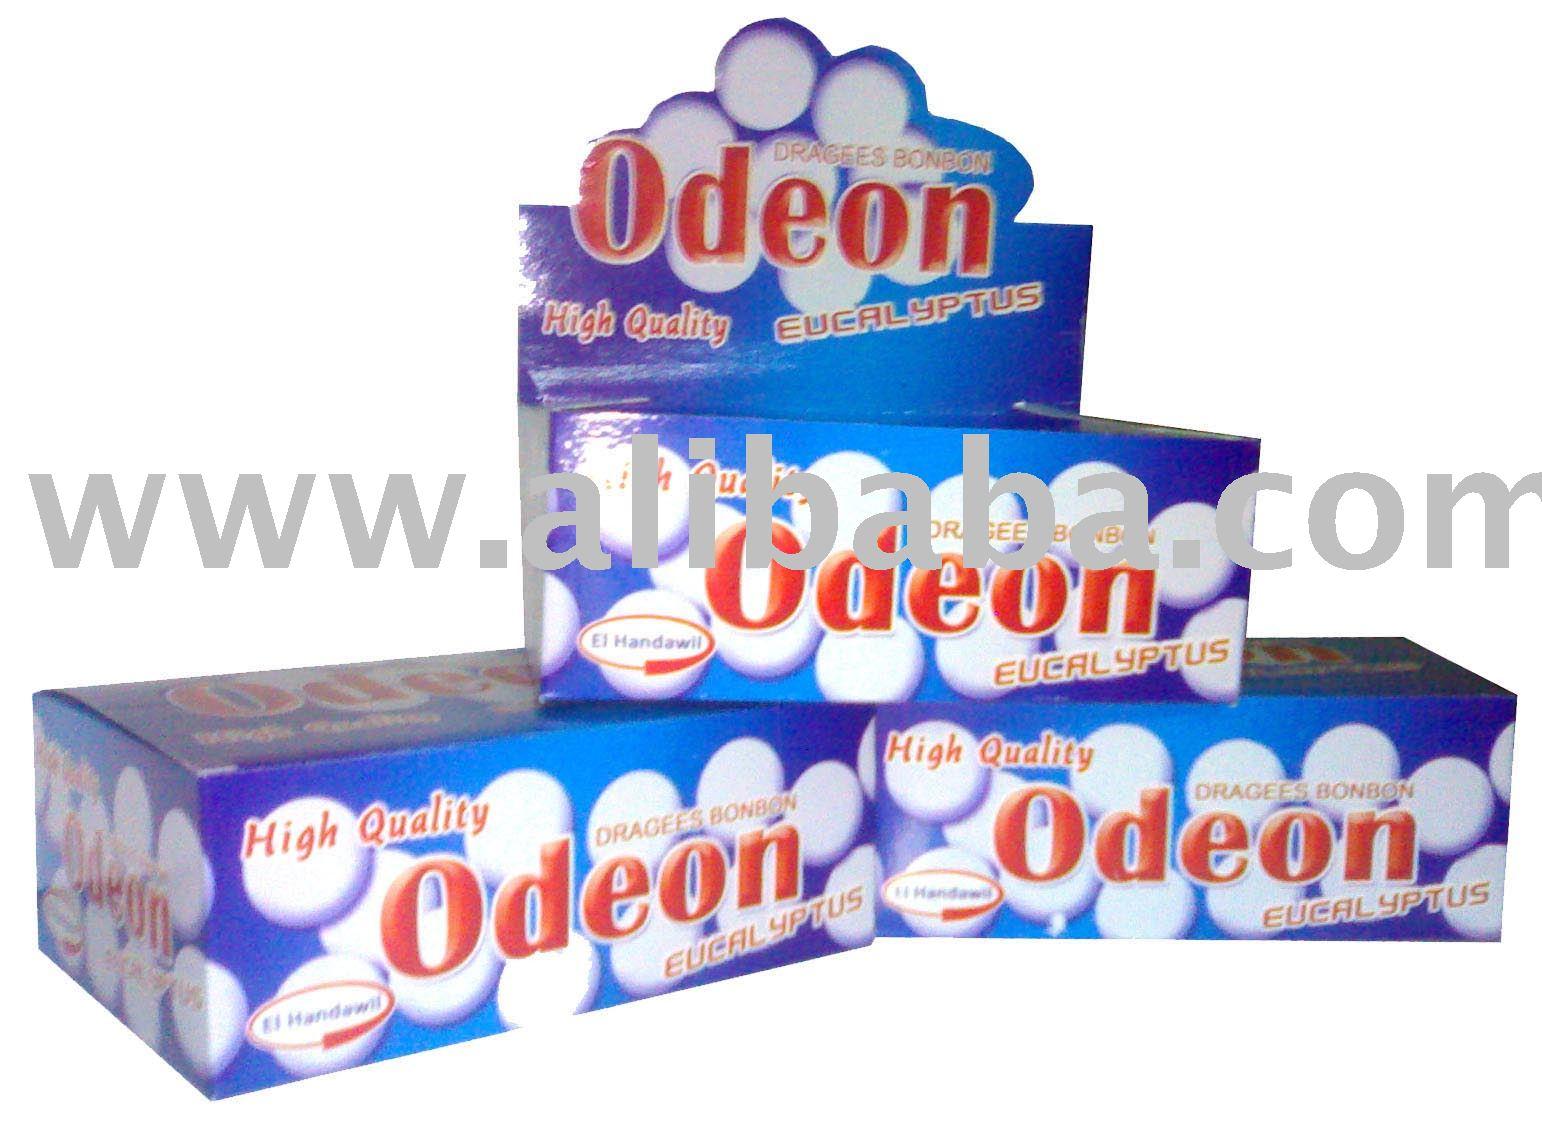 Odeon (Eucalyptus)  Confectionery